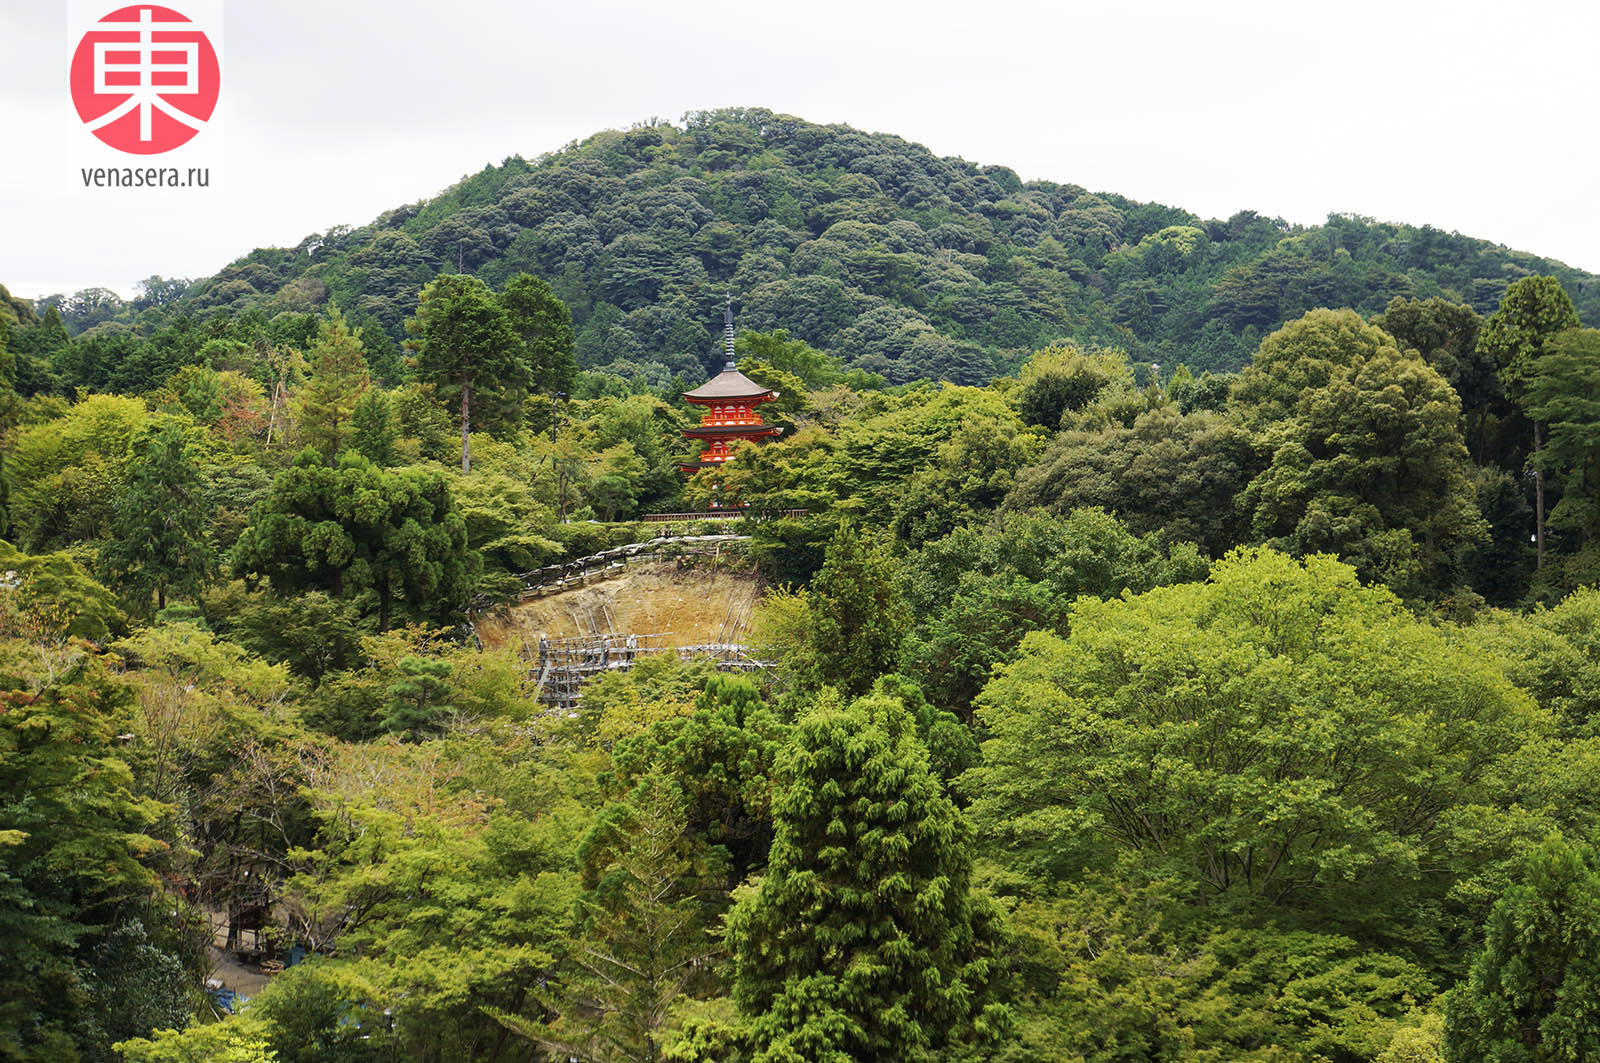 Храм Киёмидзу-дэра в Киото, 清水寺, Киото, Kyoto, 京都, Япония, Japan, 日本.